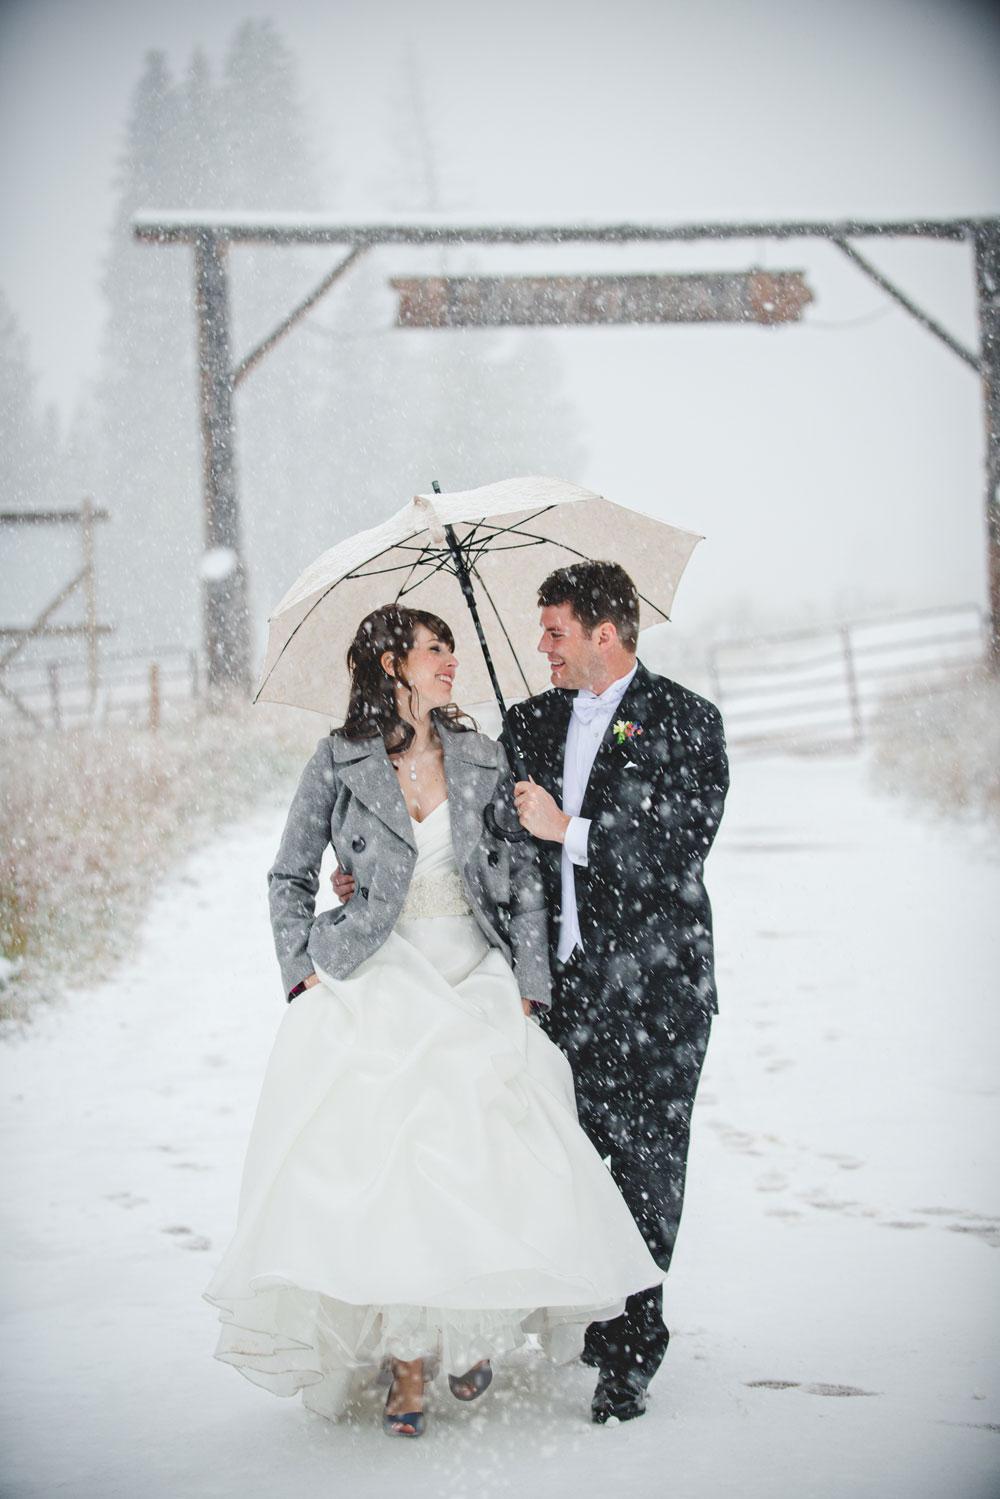 An Autumn-Meets-Winter-Wonderland Wedding, Vail Colorado